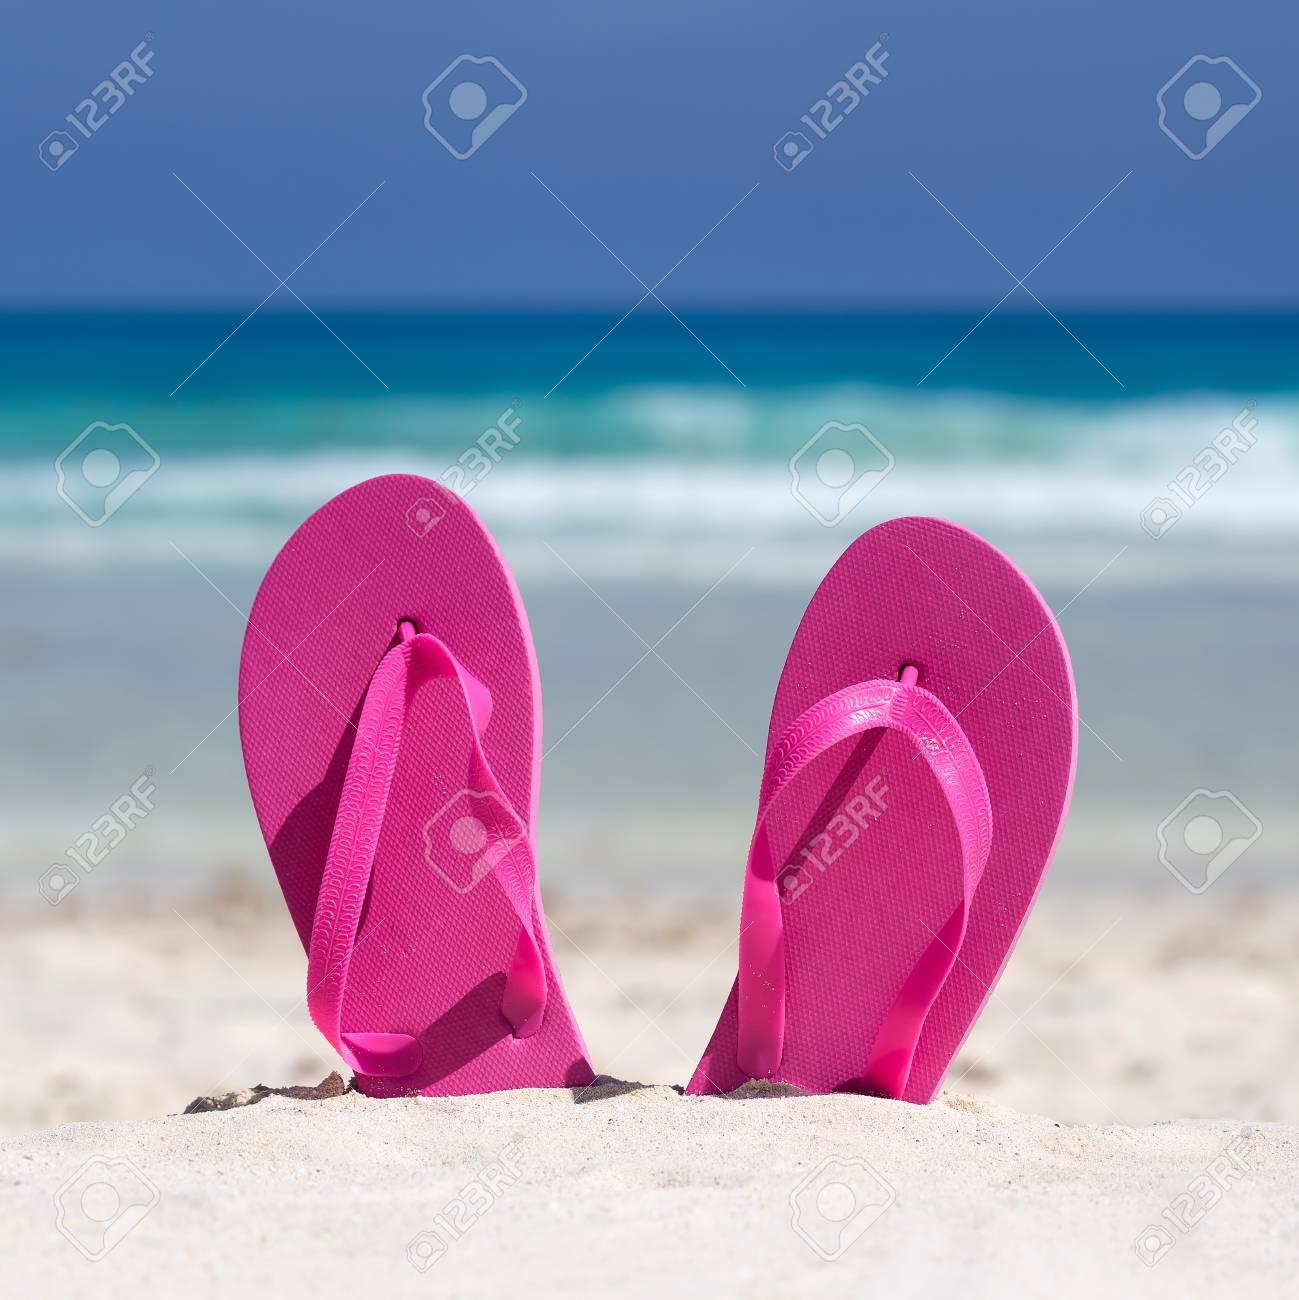 adea342350a4 Pink Flip Flops On White Sandy Beach Near Sea Waves